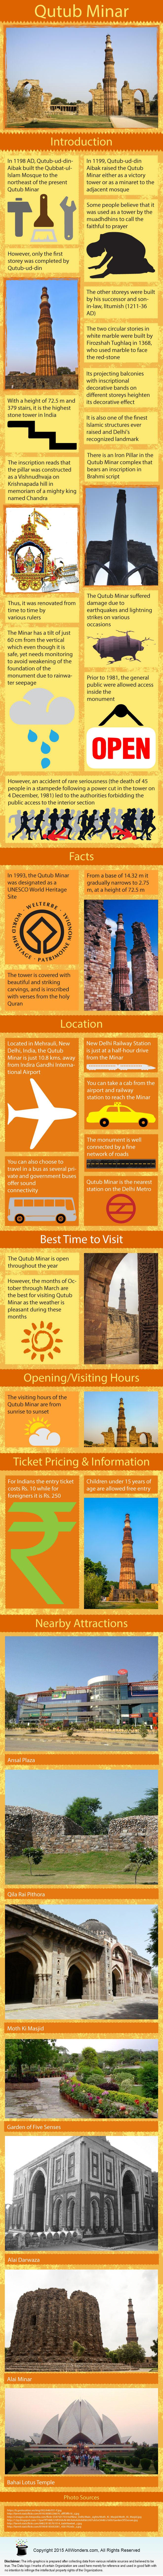 Qutub Minar Infographic